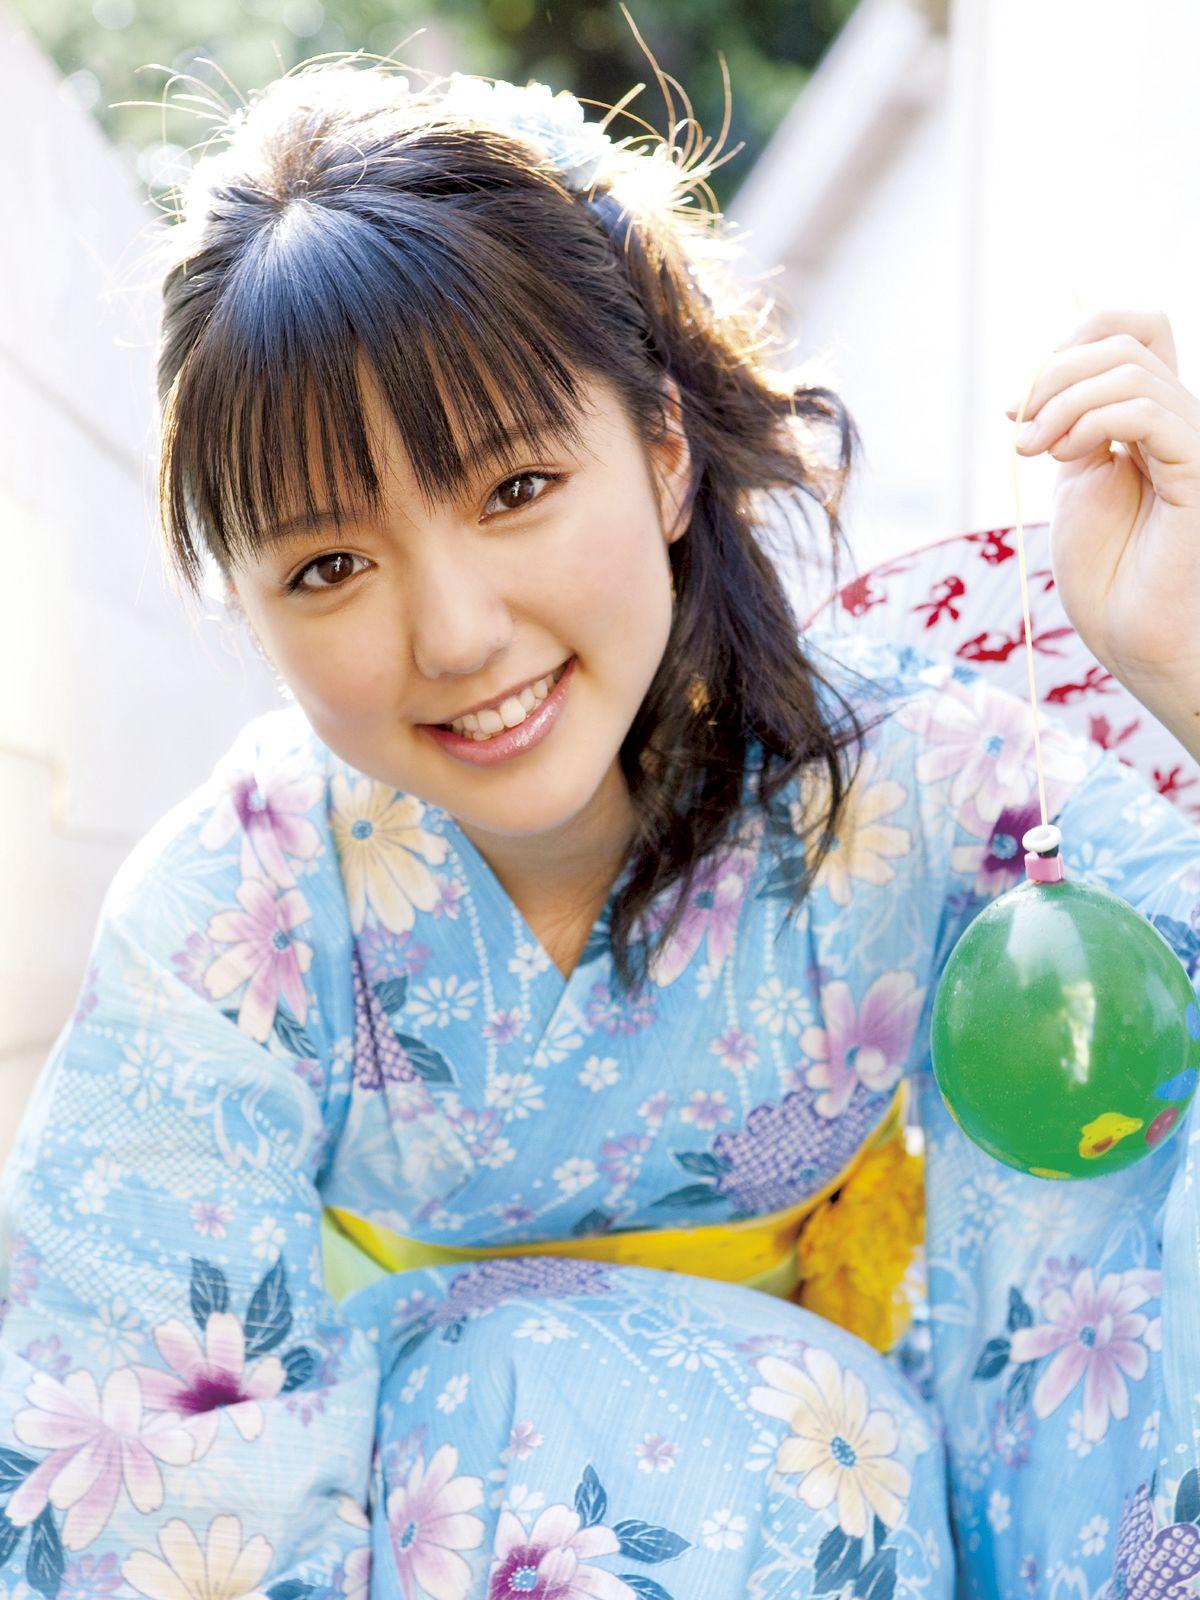 acb2d9ea8 Erina Mano #cute Pop Singers, Japanese Kimono, Japanese Girl, Yukata,  Japanese